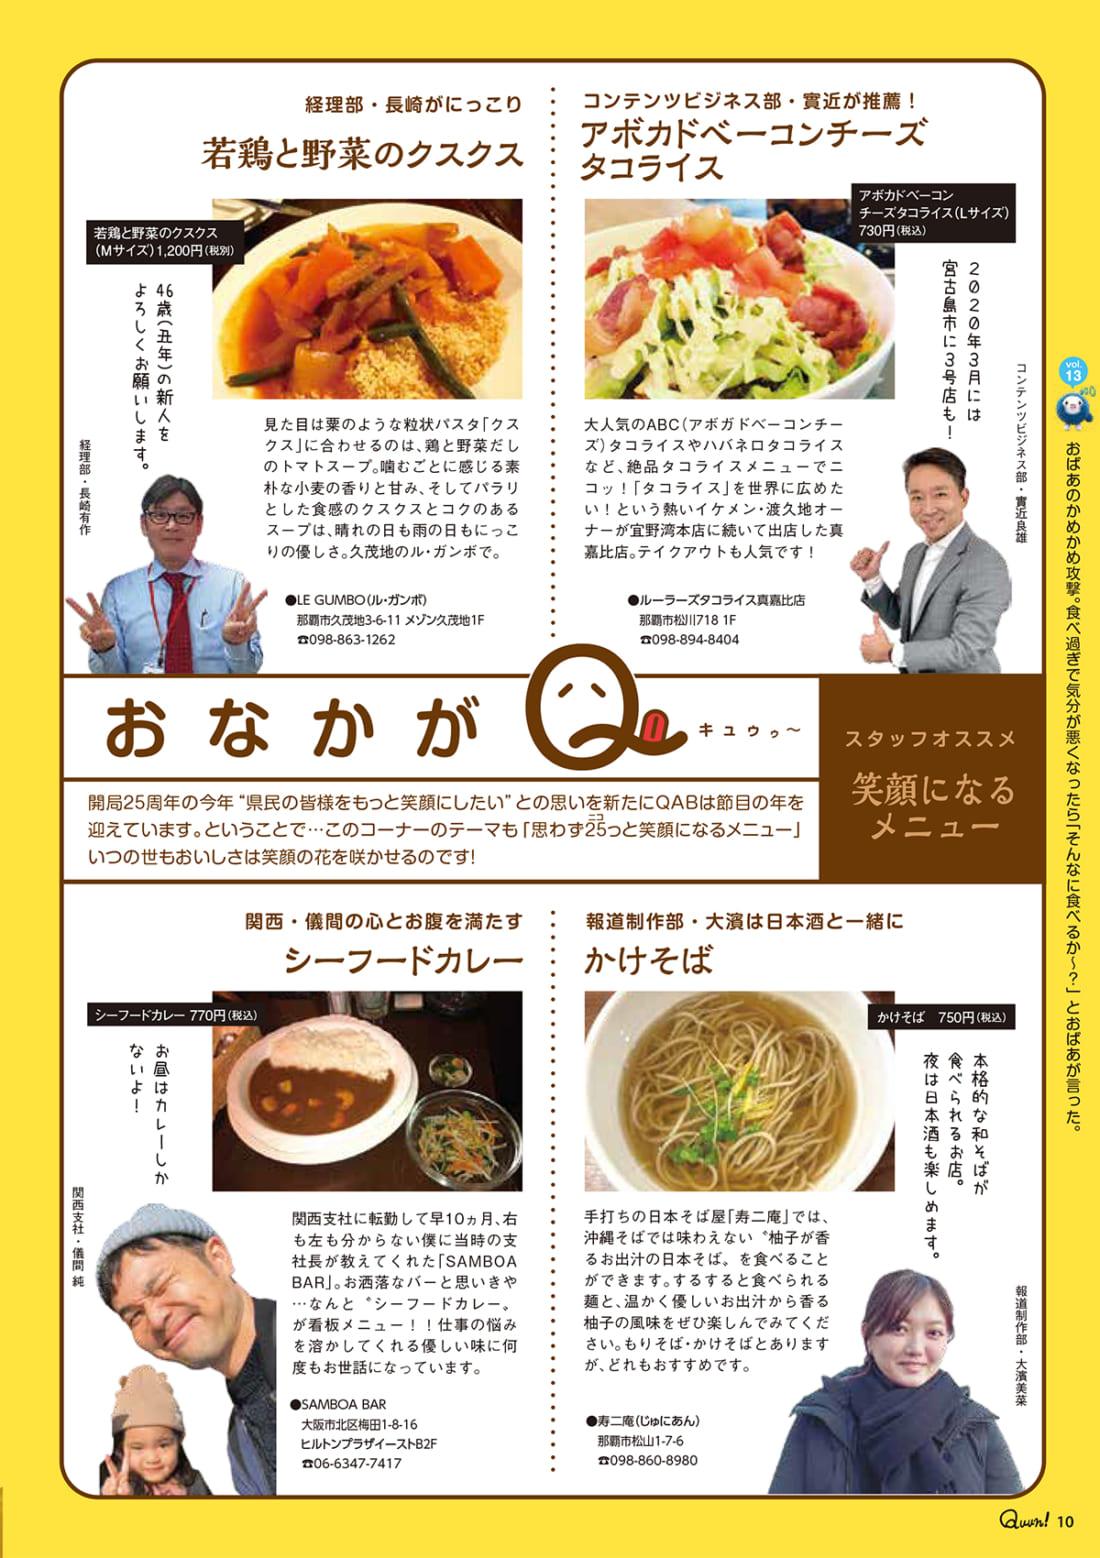 https://www.qab.co.jp/qgoro/wp-content/uploads/quun_1310-1100x1558.jpg